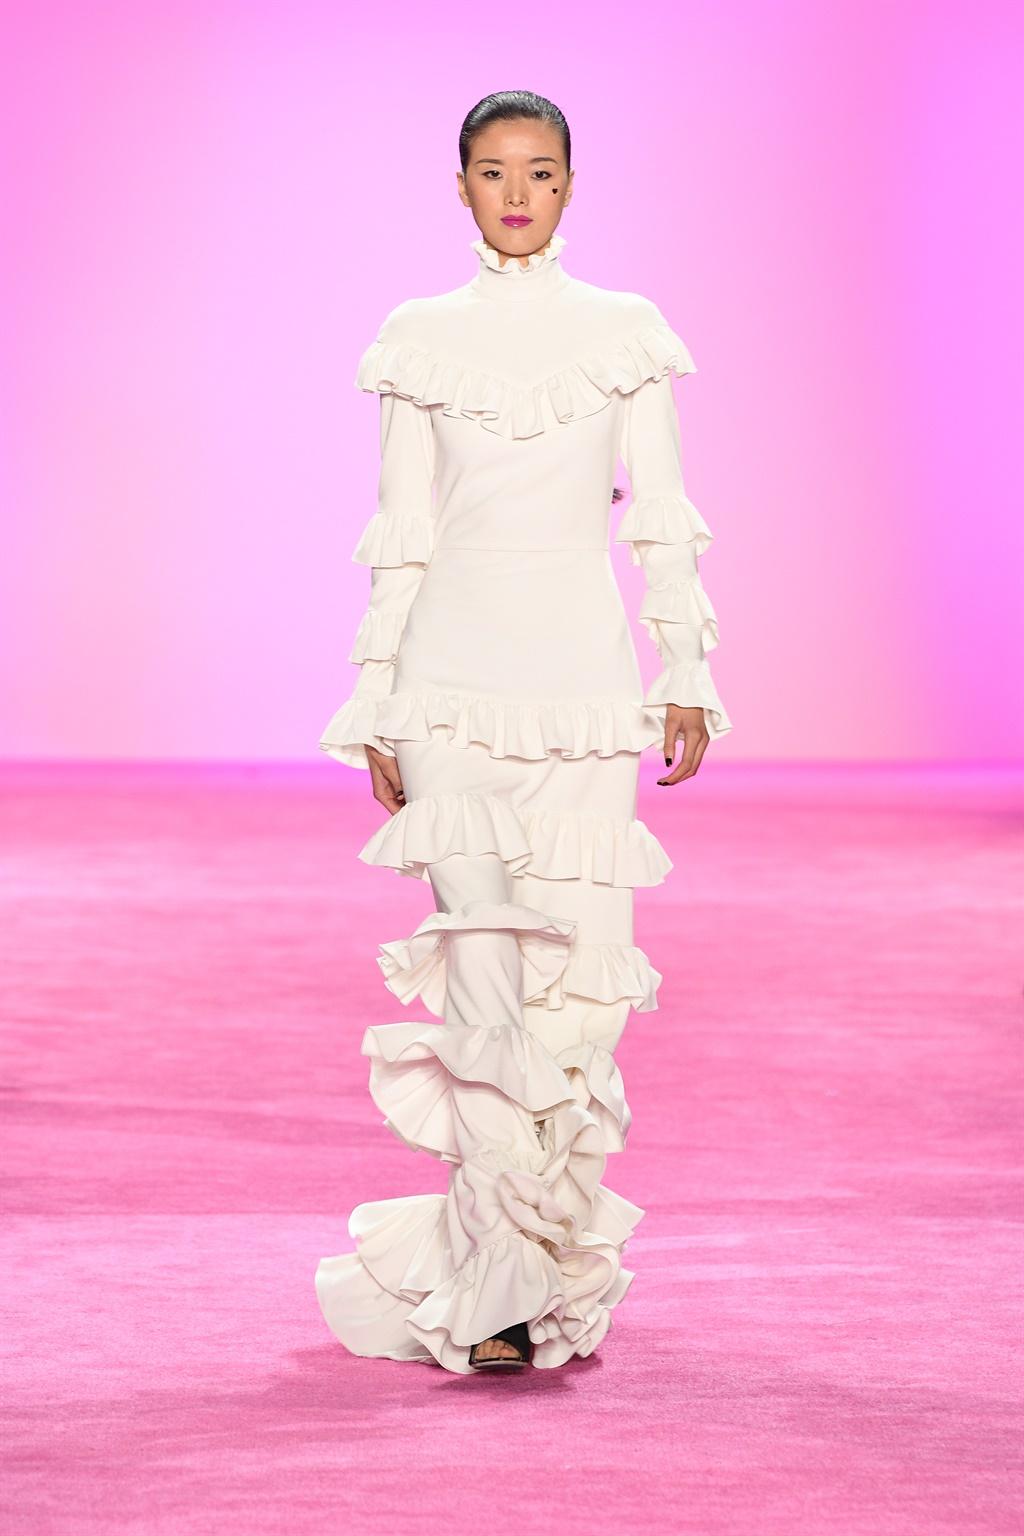 NEW YORK, NEW YORK - FEBRUARY 06: A model walks th